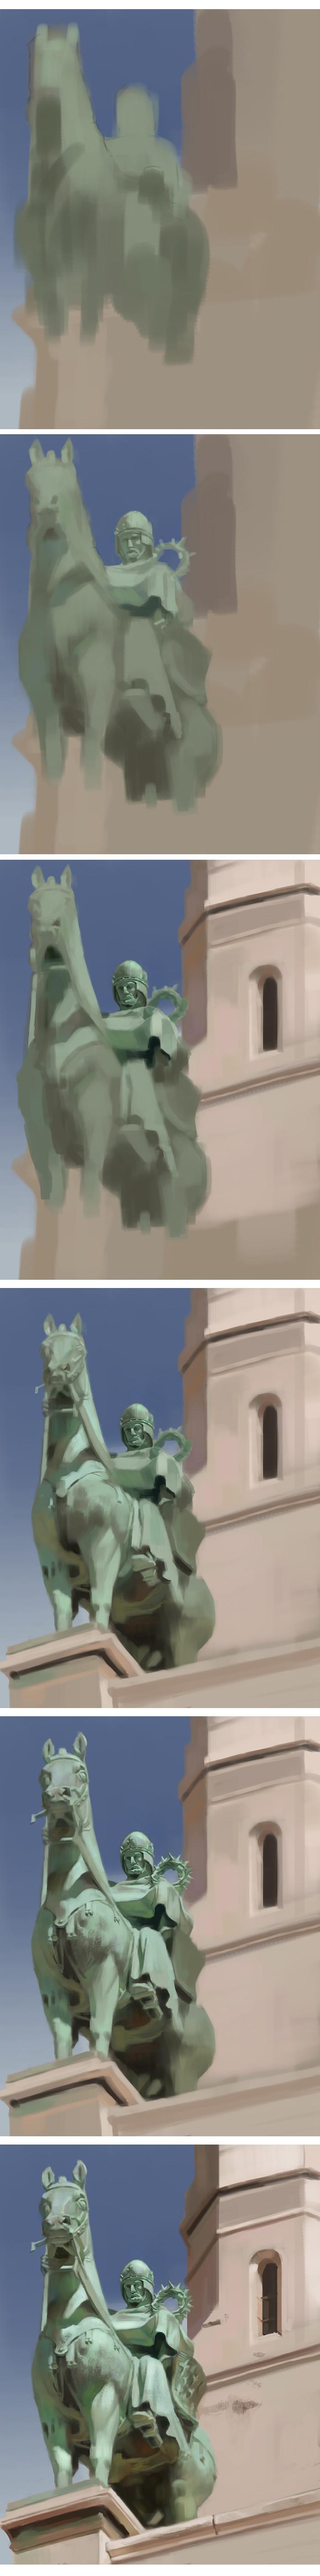 knight statue process